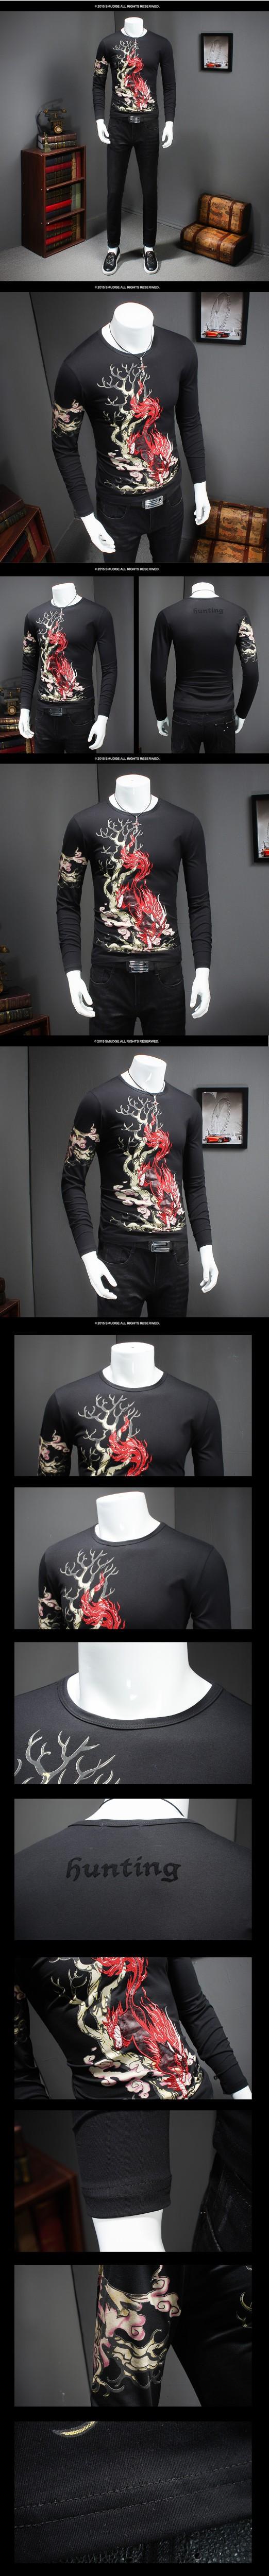 2016 Autumn&winter Fashion Man Tops Tees long Sleeve Tshirt Men's T-shirt brand  round neck shirts men Free Shipping size M-5XL